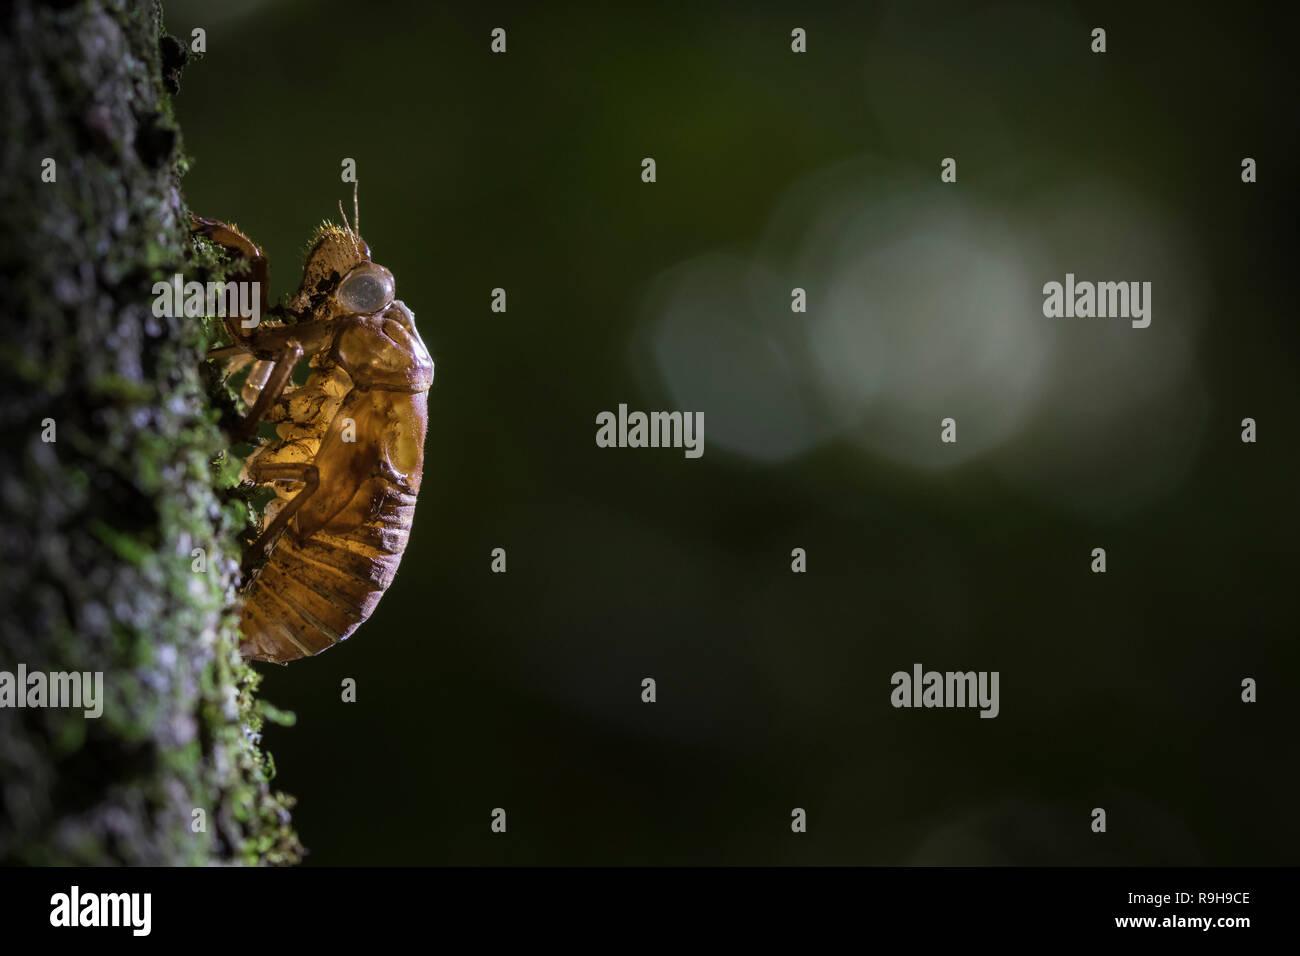 Abandoned exoskeleton of cicada (Cicadoidea) on the bark of a tree. La Selva Biological Station. Costa Rica. - Stock Image